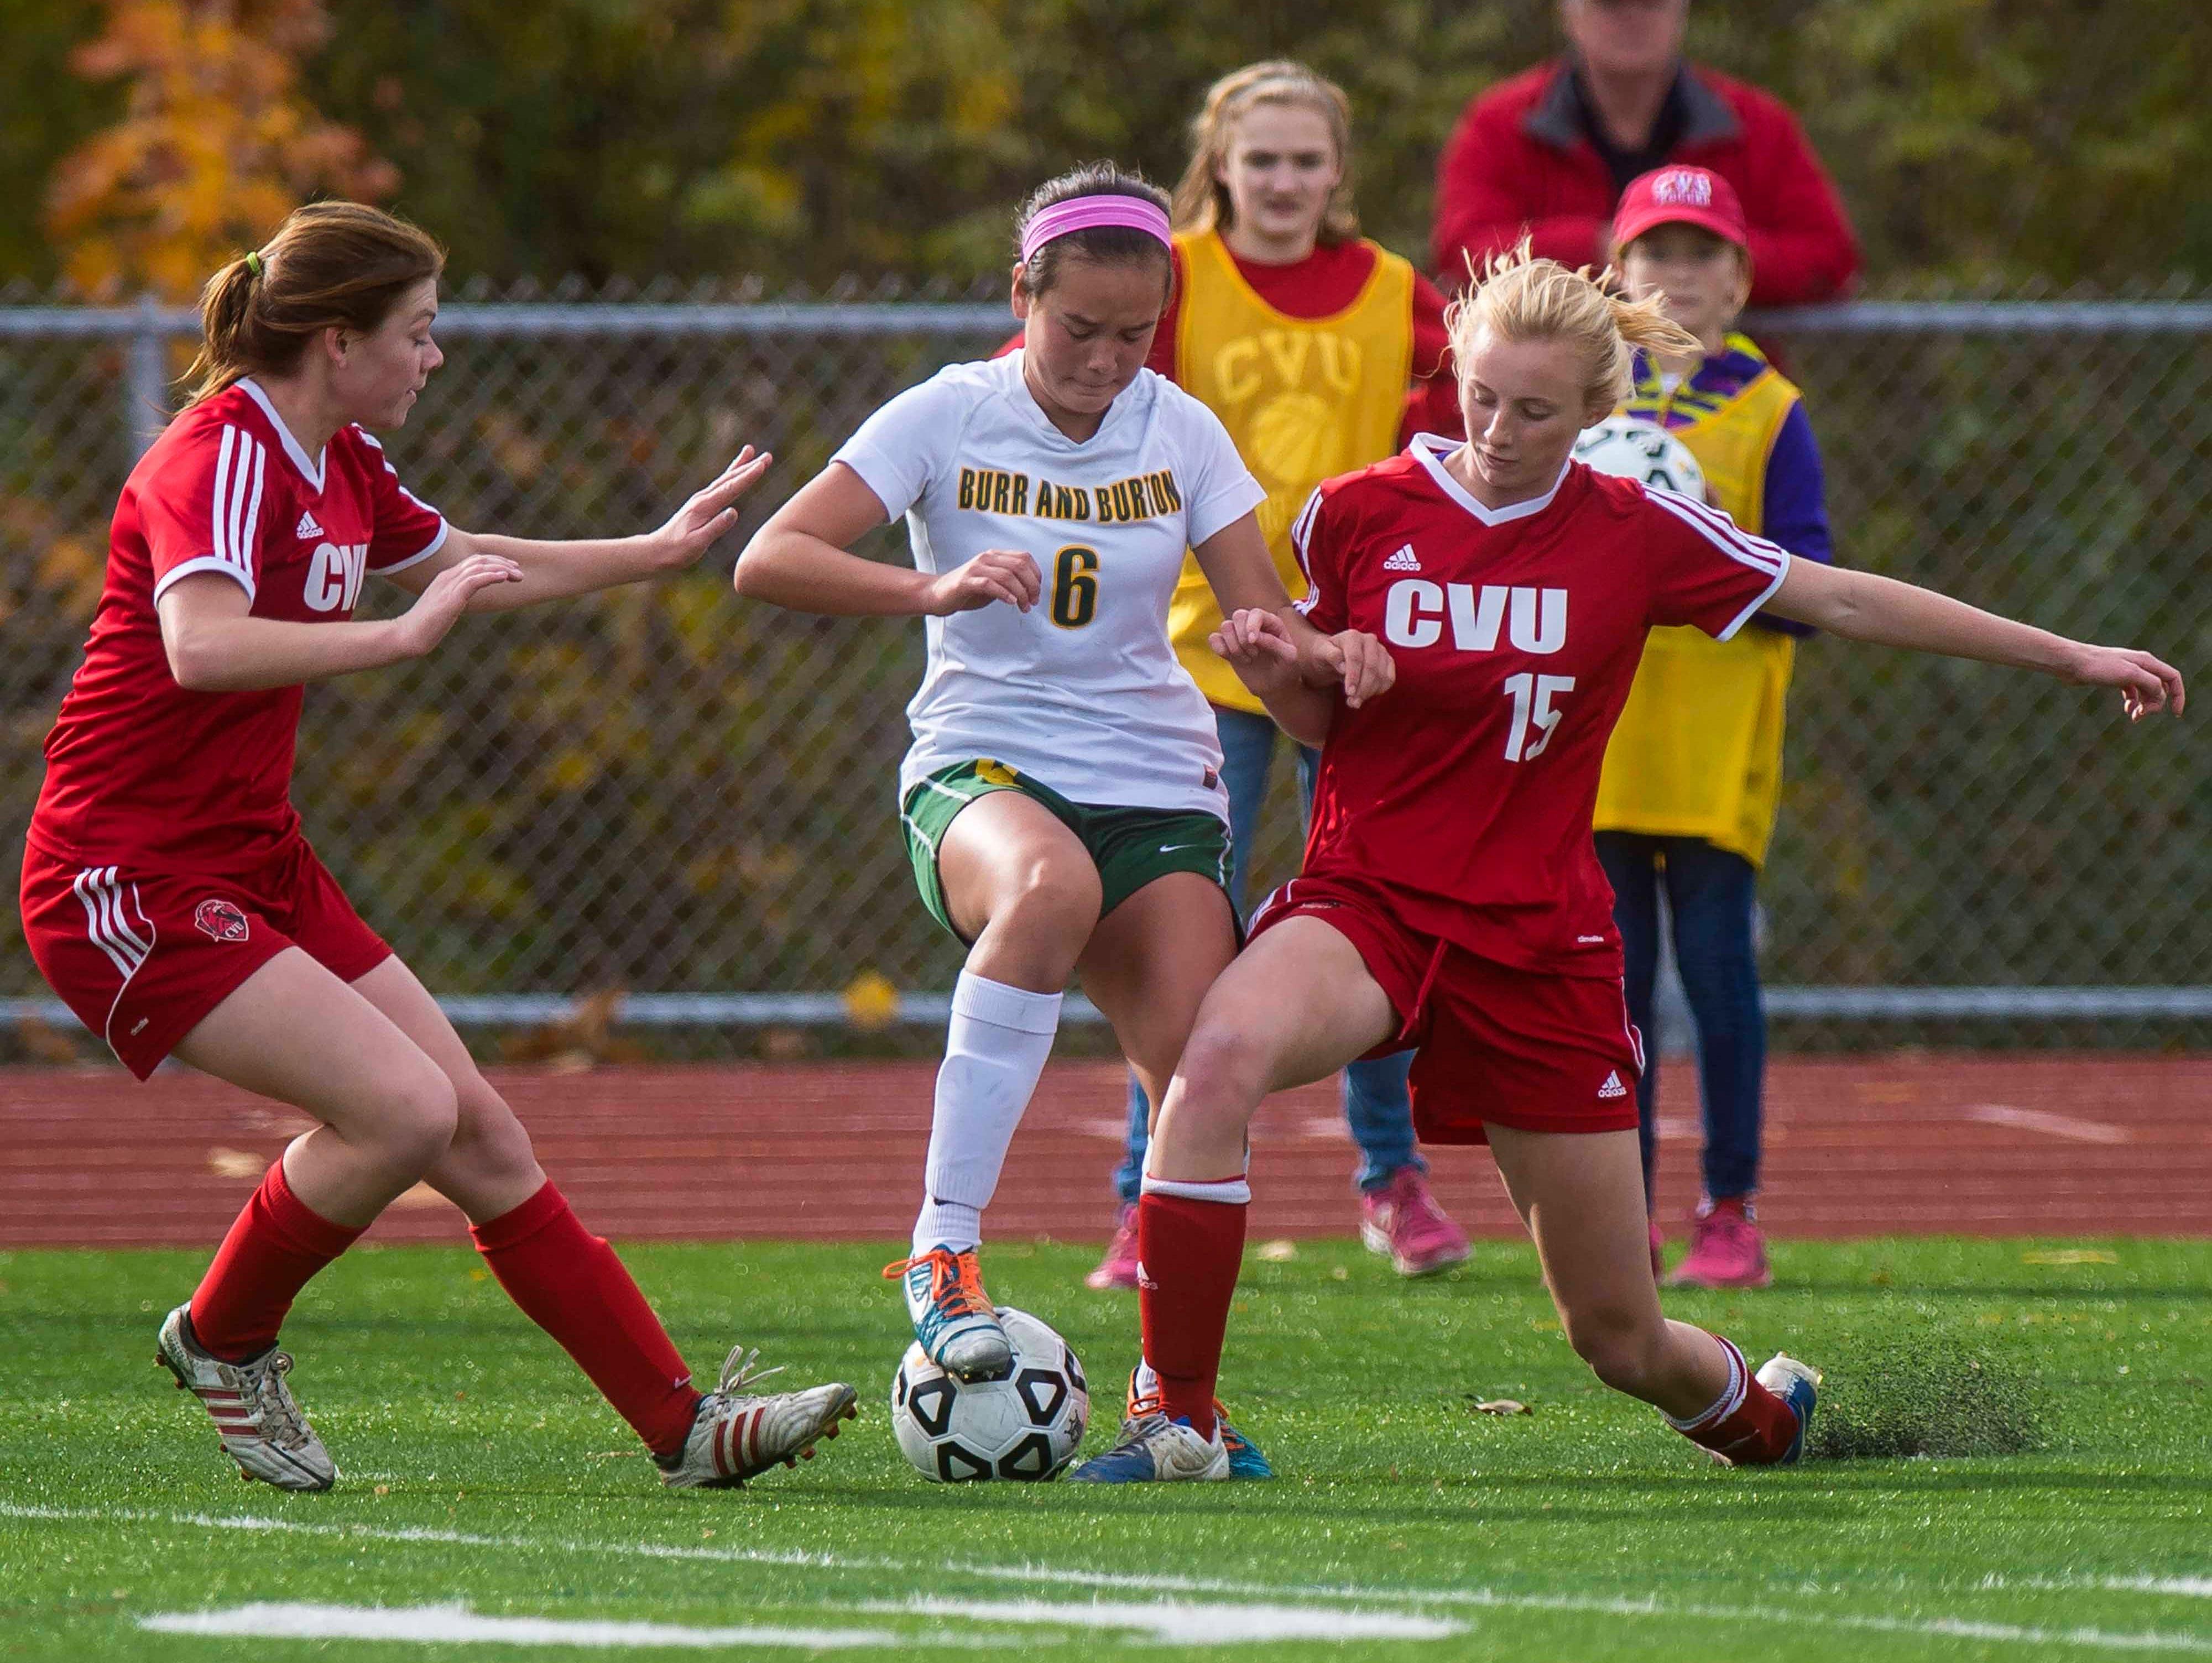 Burr & Burton's Georgia Lord, center, foots the ball between CVU's Megan Gannon, left, and Sierra Morton in the Division I girls soccer championship in Burlington on Saturday, October 31, 2015.